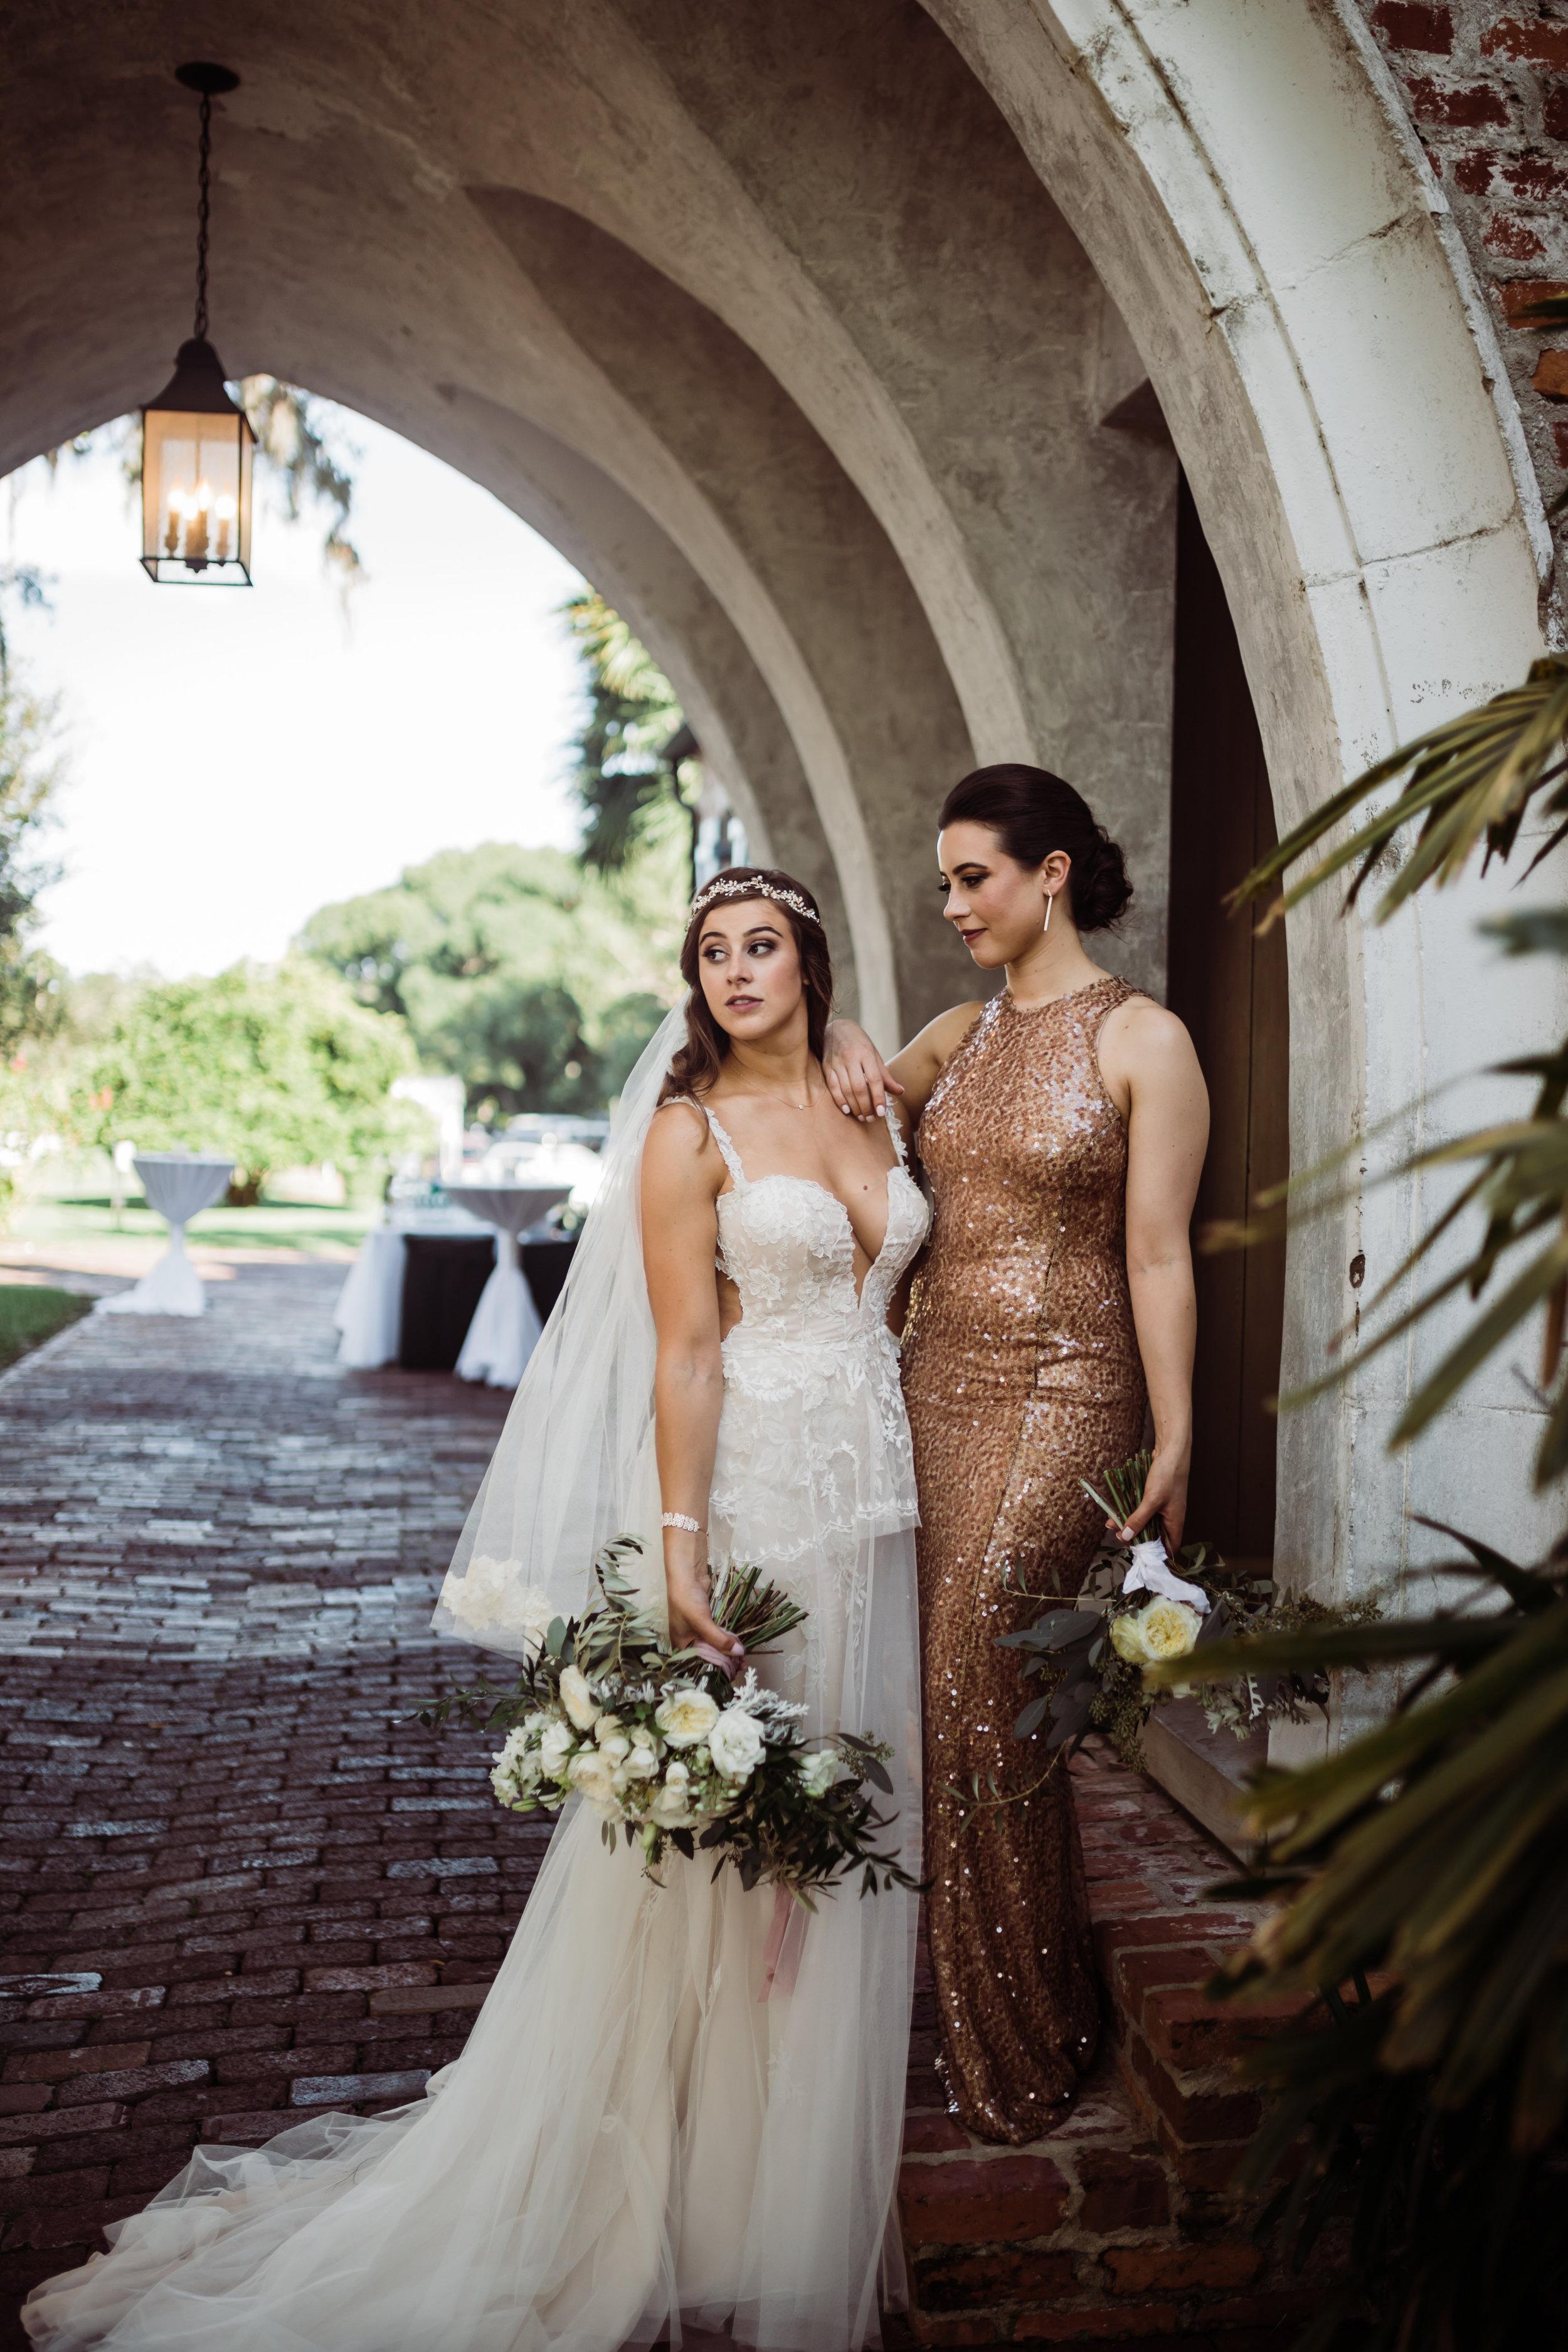 2017.10.15 Steffi and Elliott Simmonds Casa Feliz Wedding (367 of 969).jpg